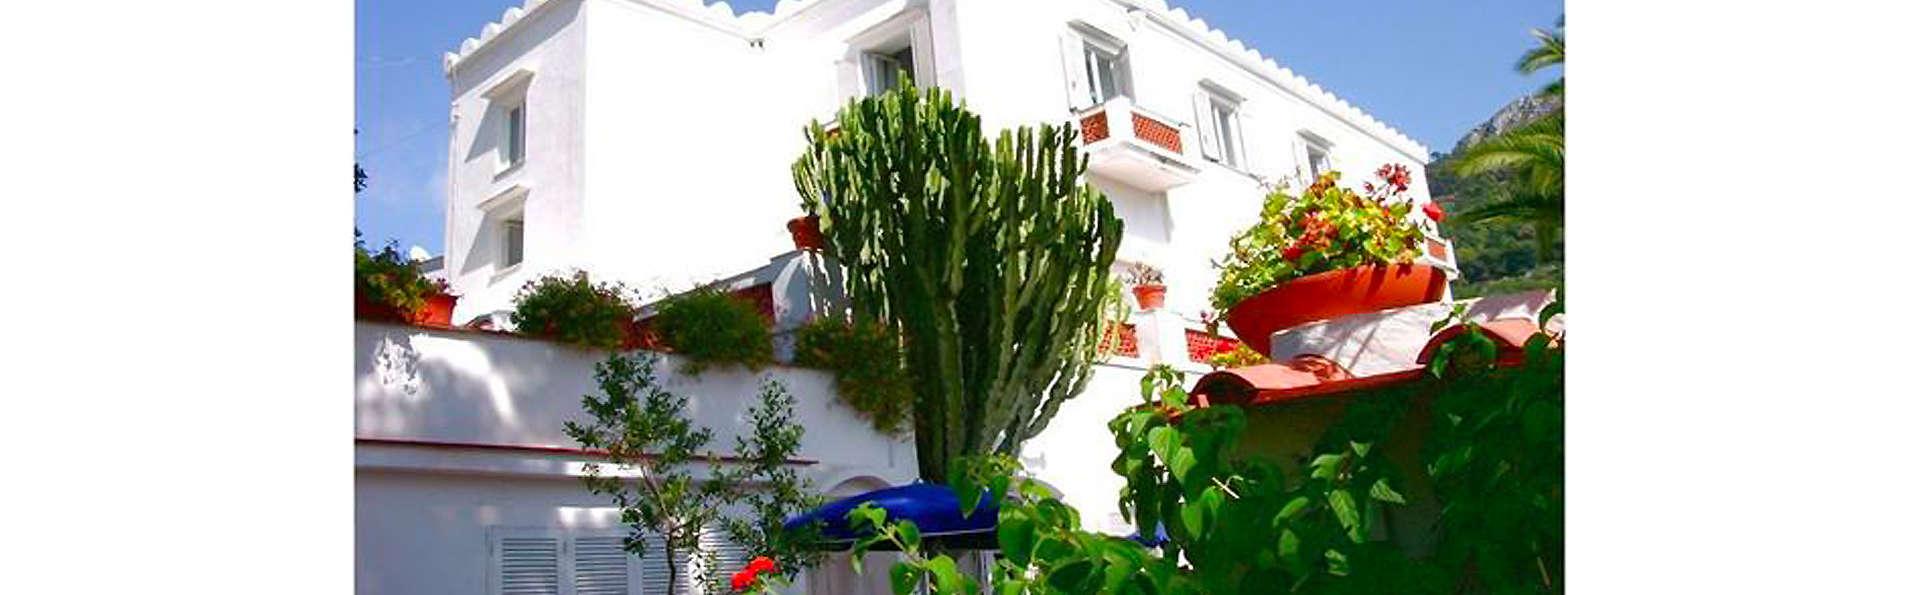 Hotel Casa Caprile - EDIT_EXTERIOR_01.jpg